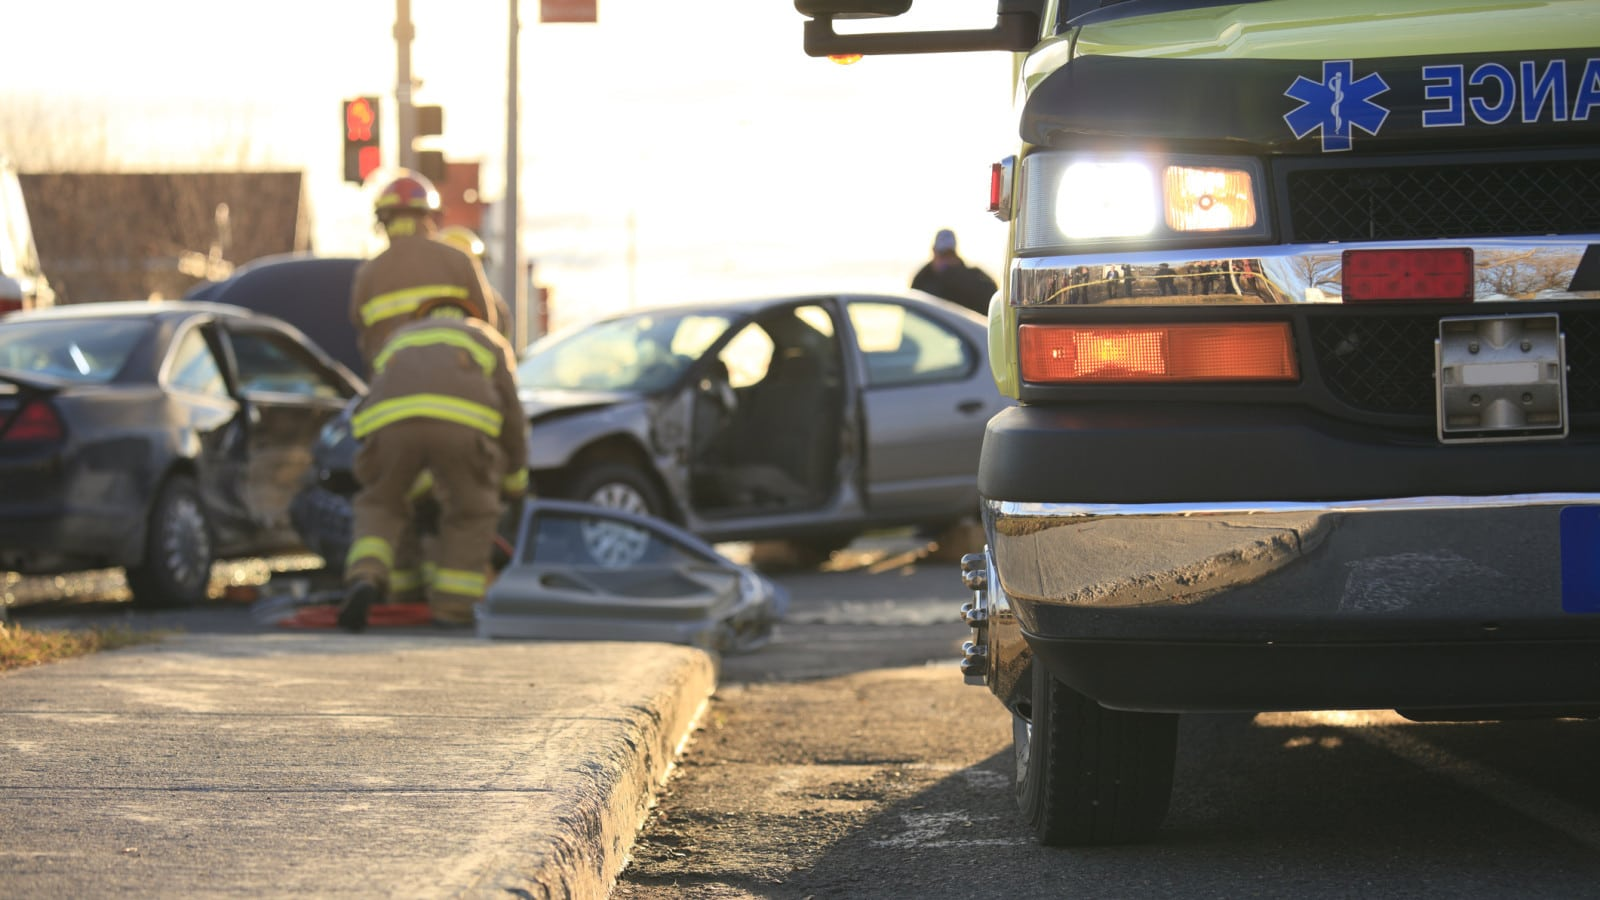 Ambulance Accident Scene Stock Photo